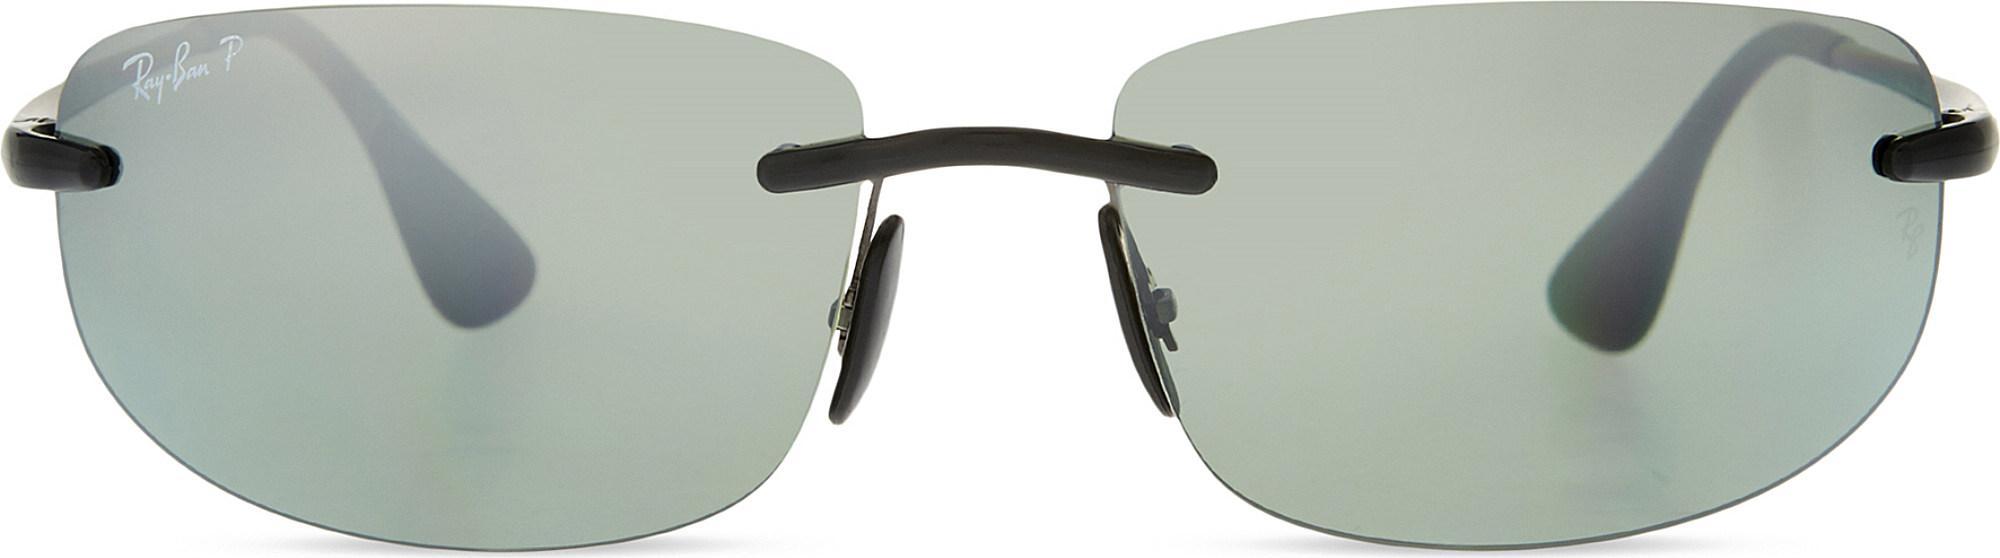 6f69e17b4d Ray-Ban Rb4254 Chromance Rectangle Sunglasses in Black - Lyst